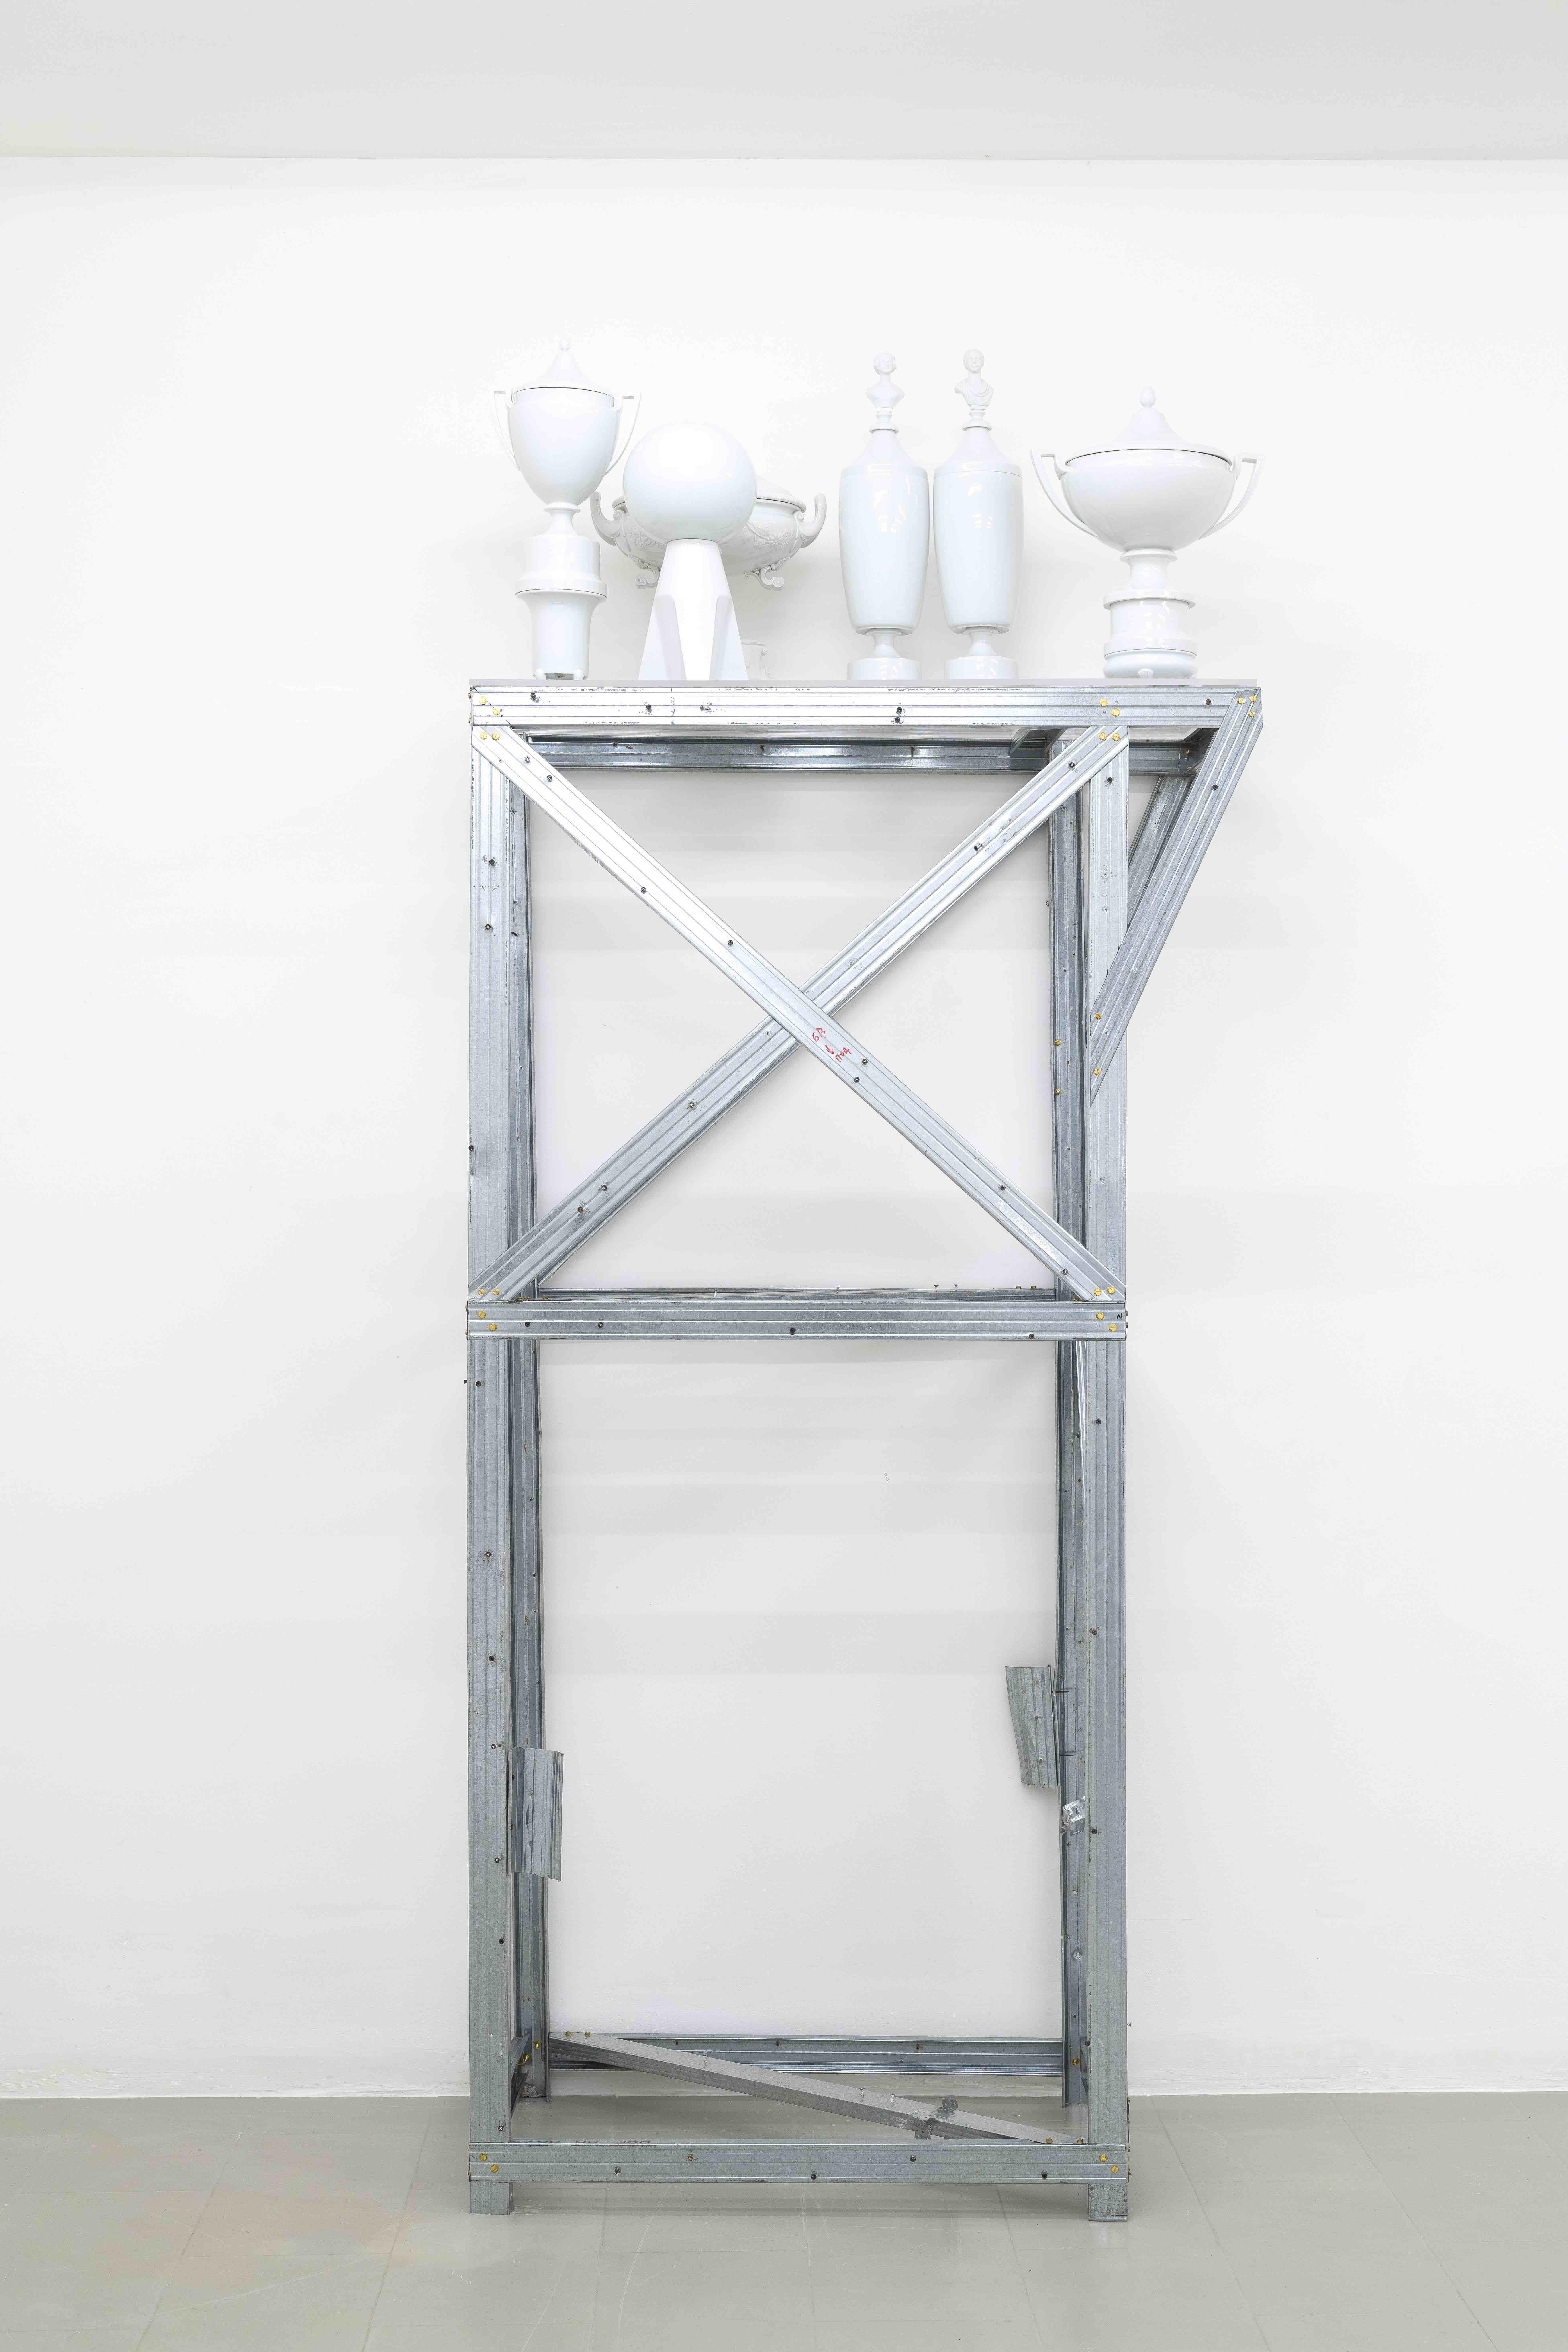 Plamen Dejanoff, Untitled, 2019, Aluminium Sculpture, Plexi, 6 Porcelain Sculptures, 229 x 126cm